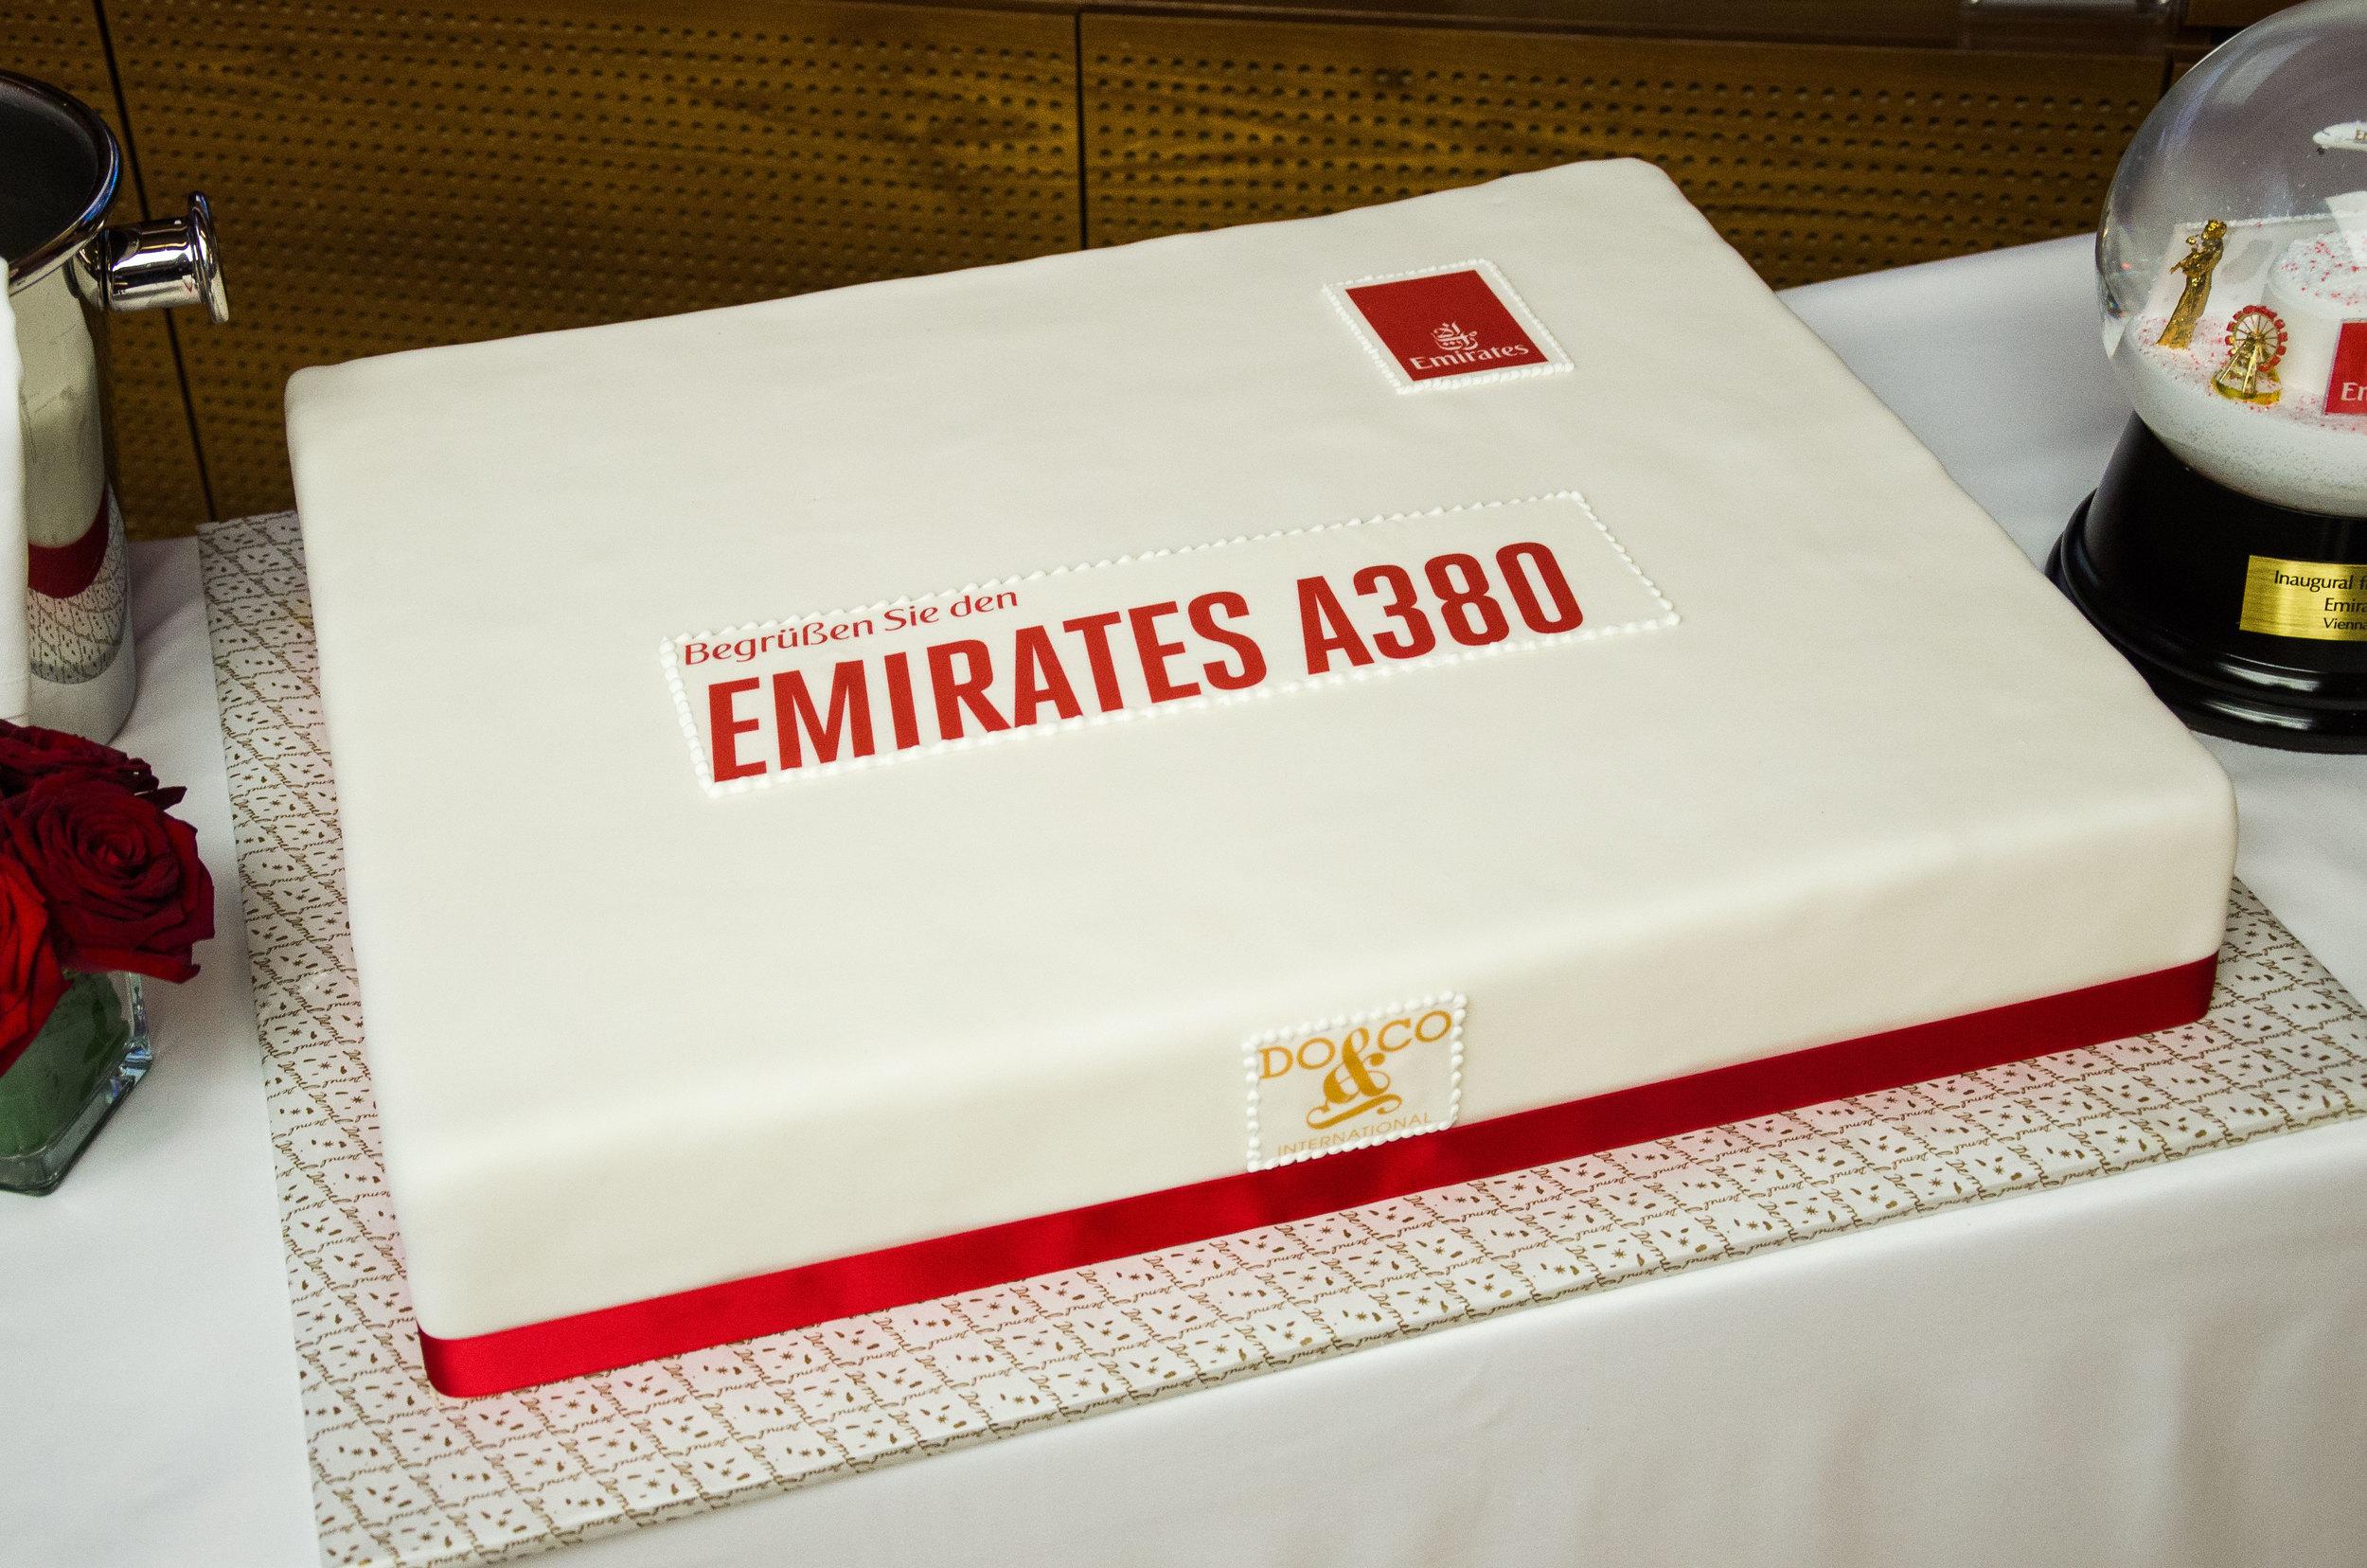 The celebration cake made by Do&Co